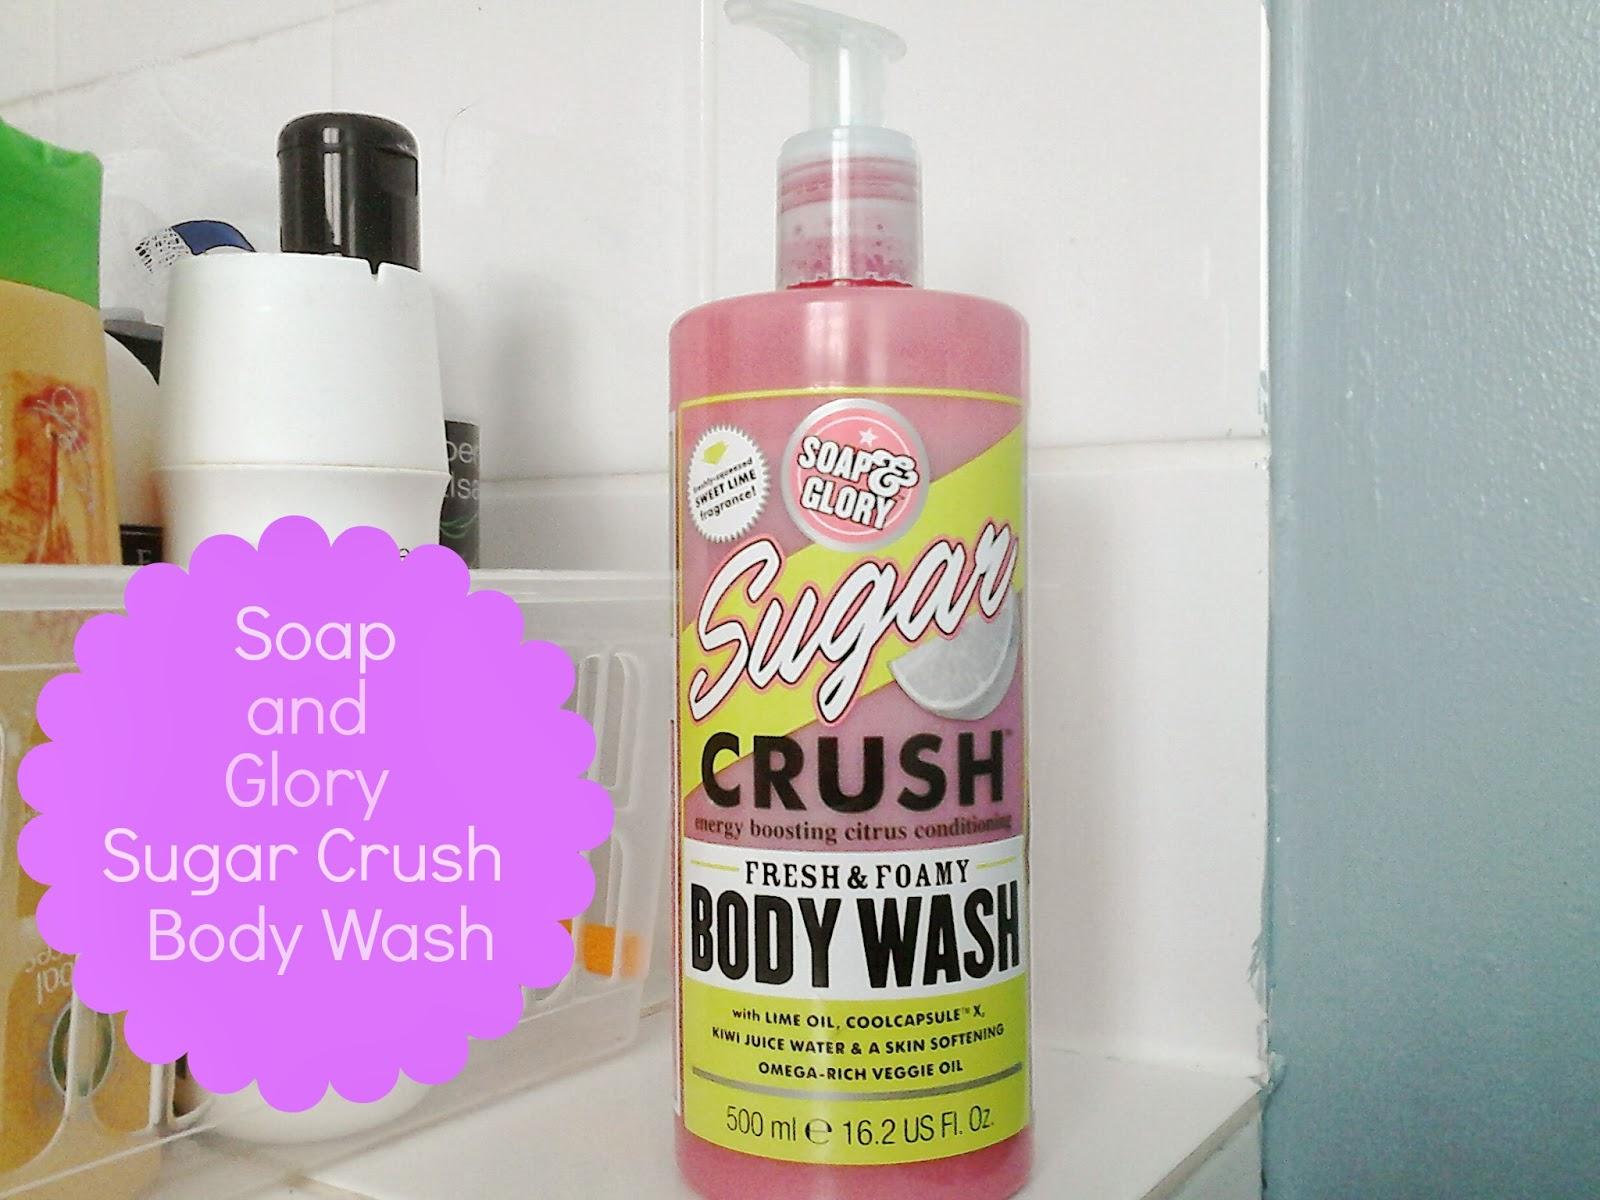 Soap and Glory Sugar Crush Body Wash